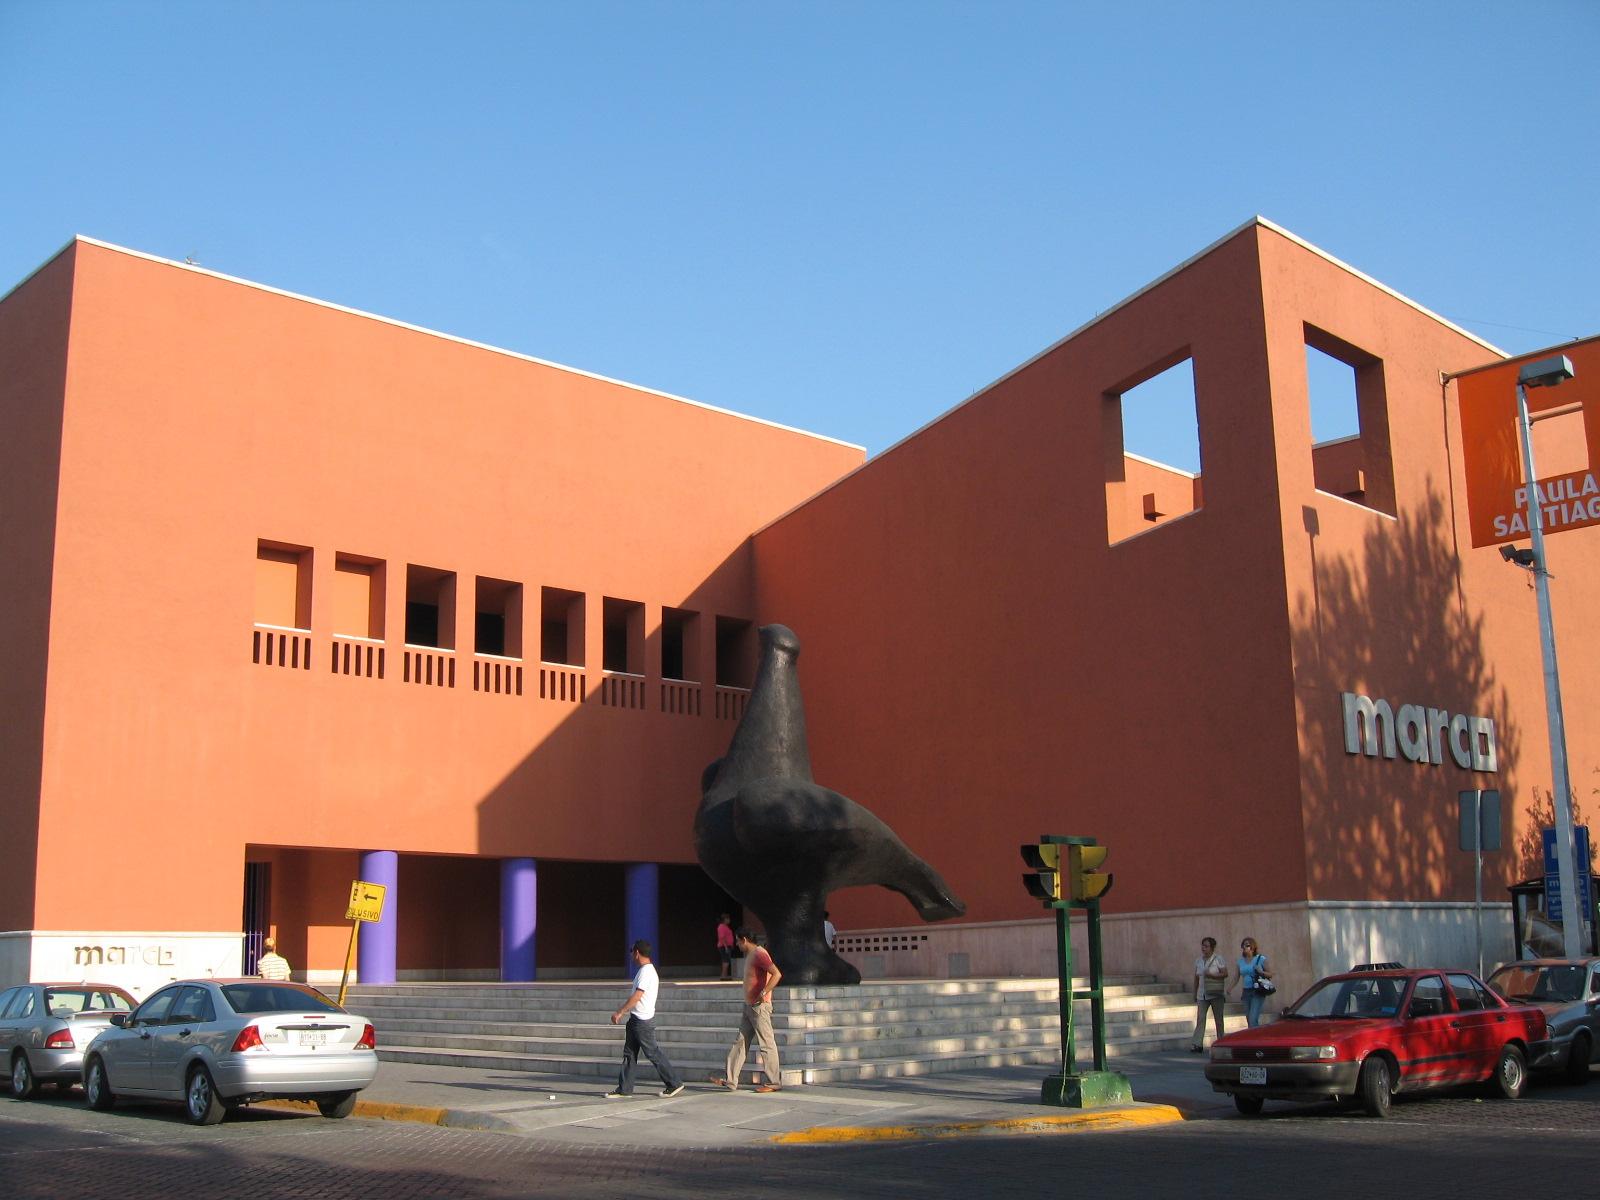 10 museos de México que deberías conocer si viajas a ese país 1